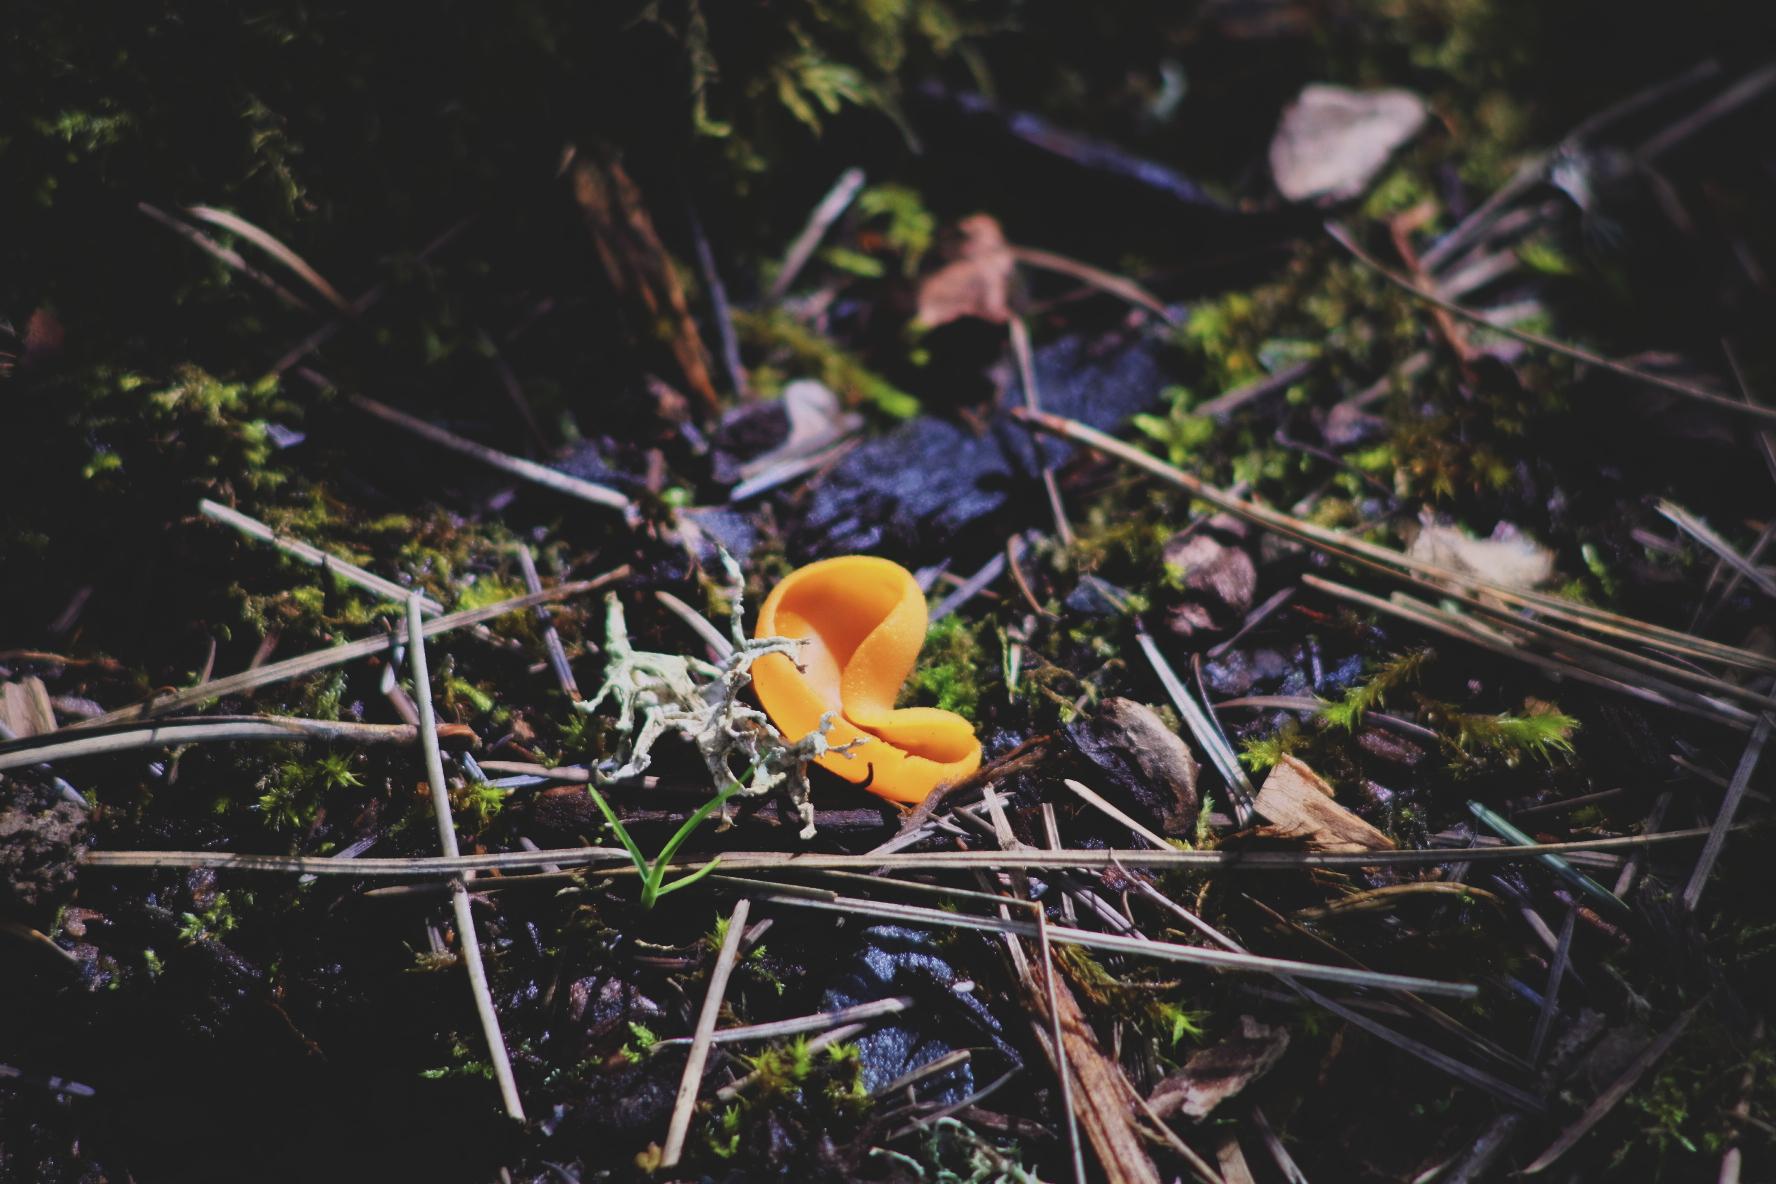 84. A Fungus Amongus